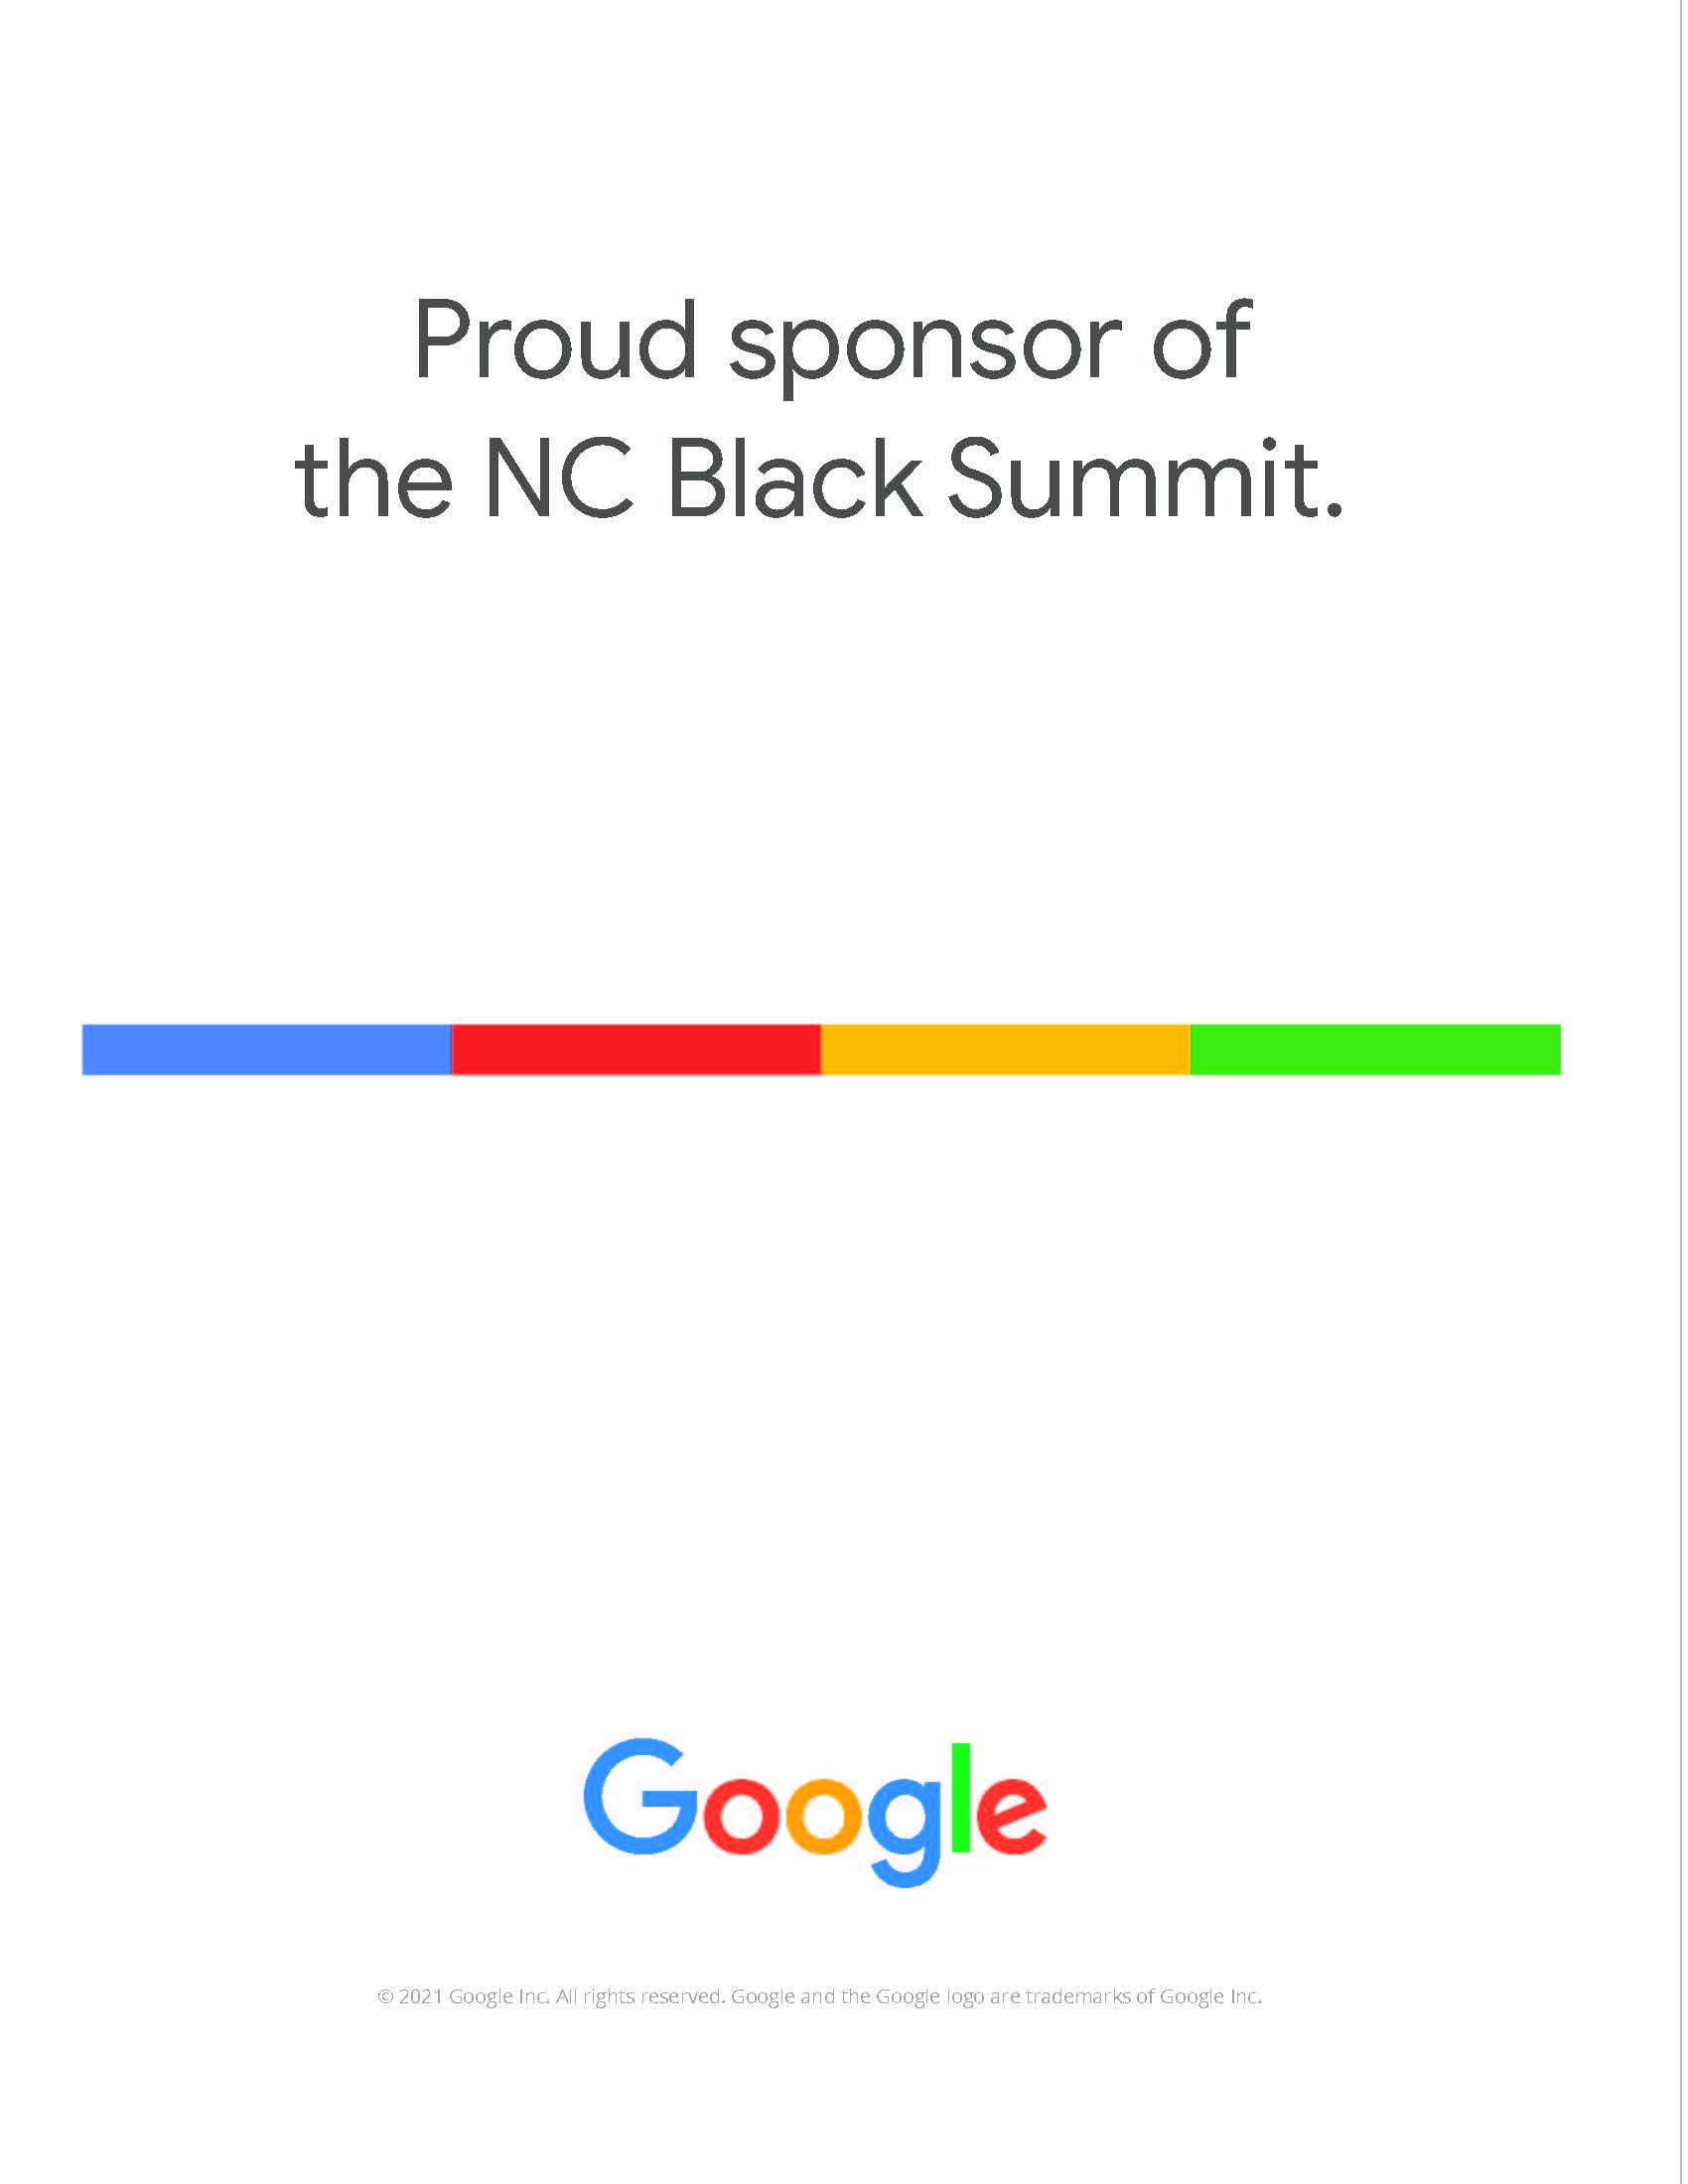 Ad: Google